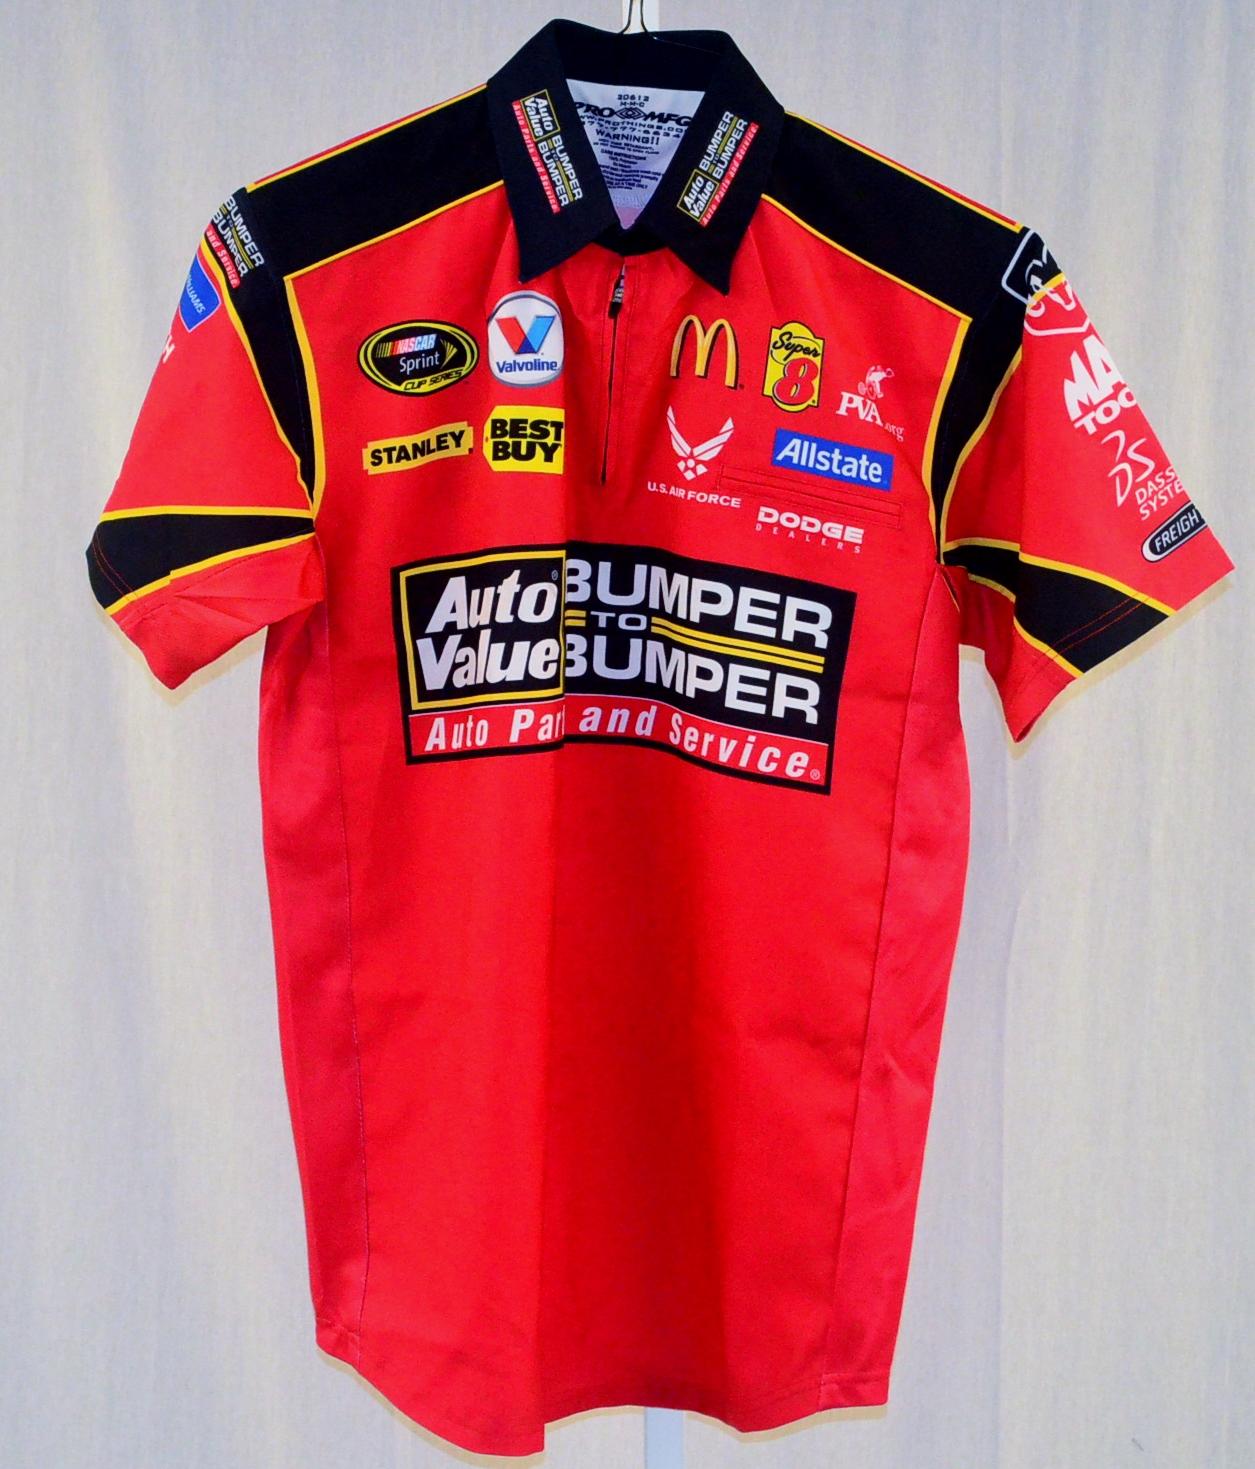 Nascar Pit Crew Shirts >> Kasey Kahne Auto Value Evernham Race Used NASCAR Pit Crew ...